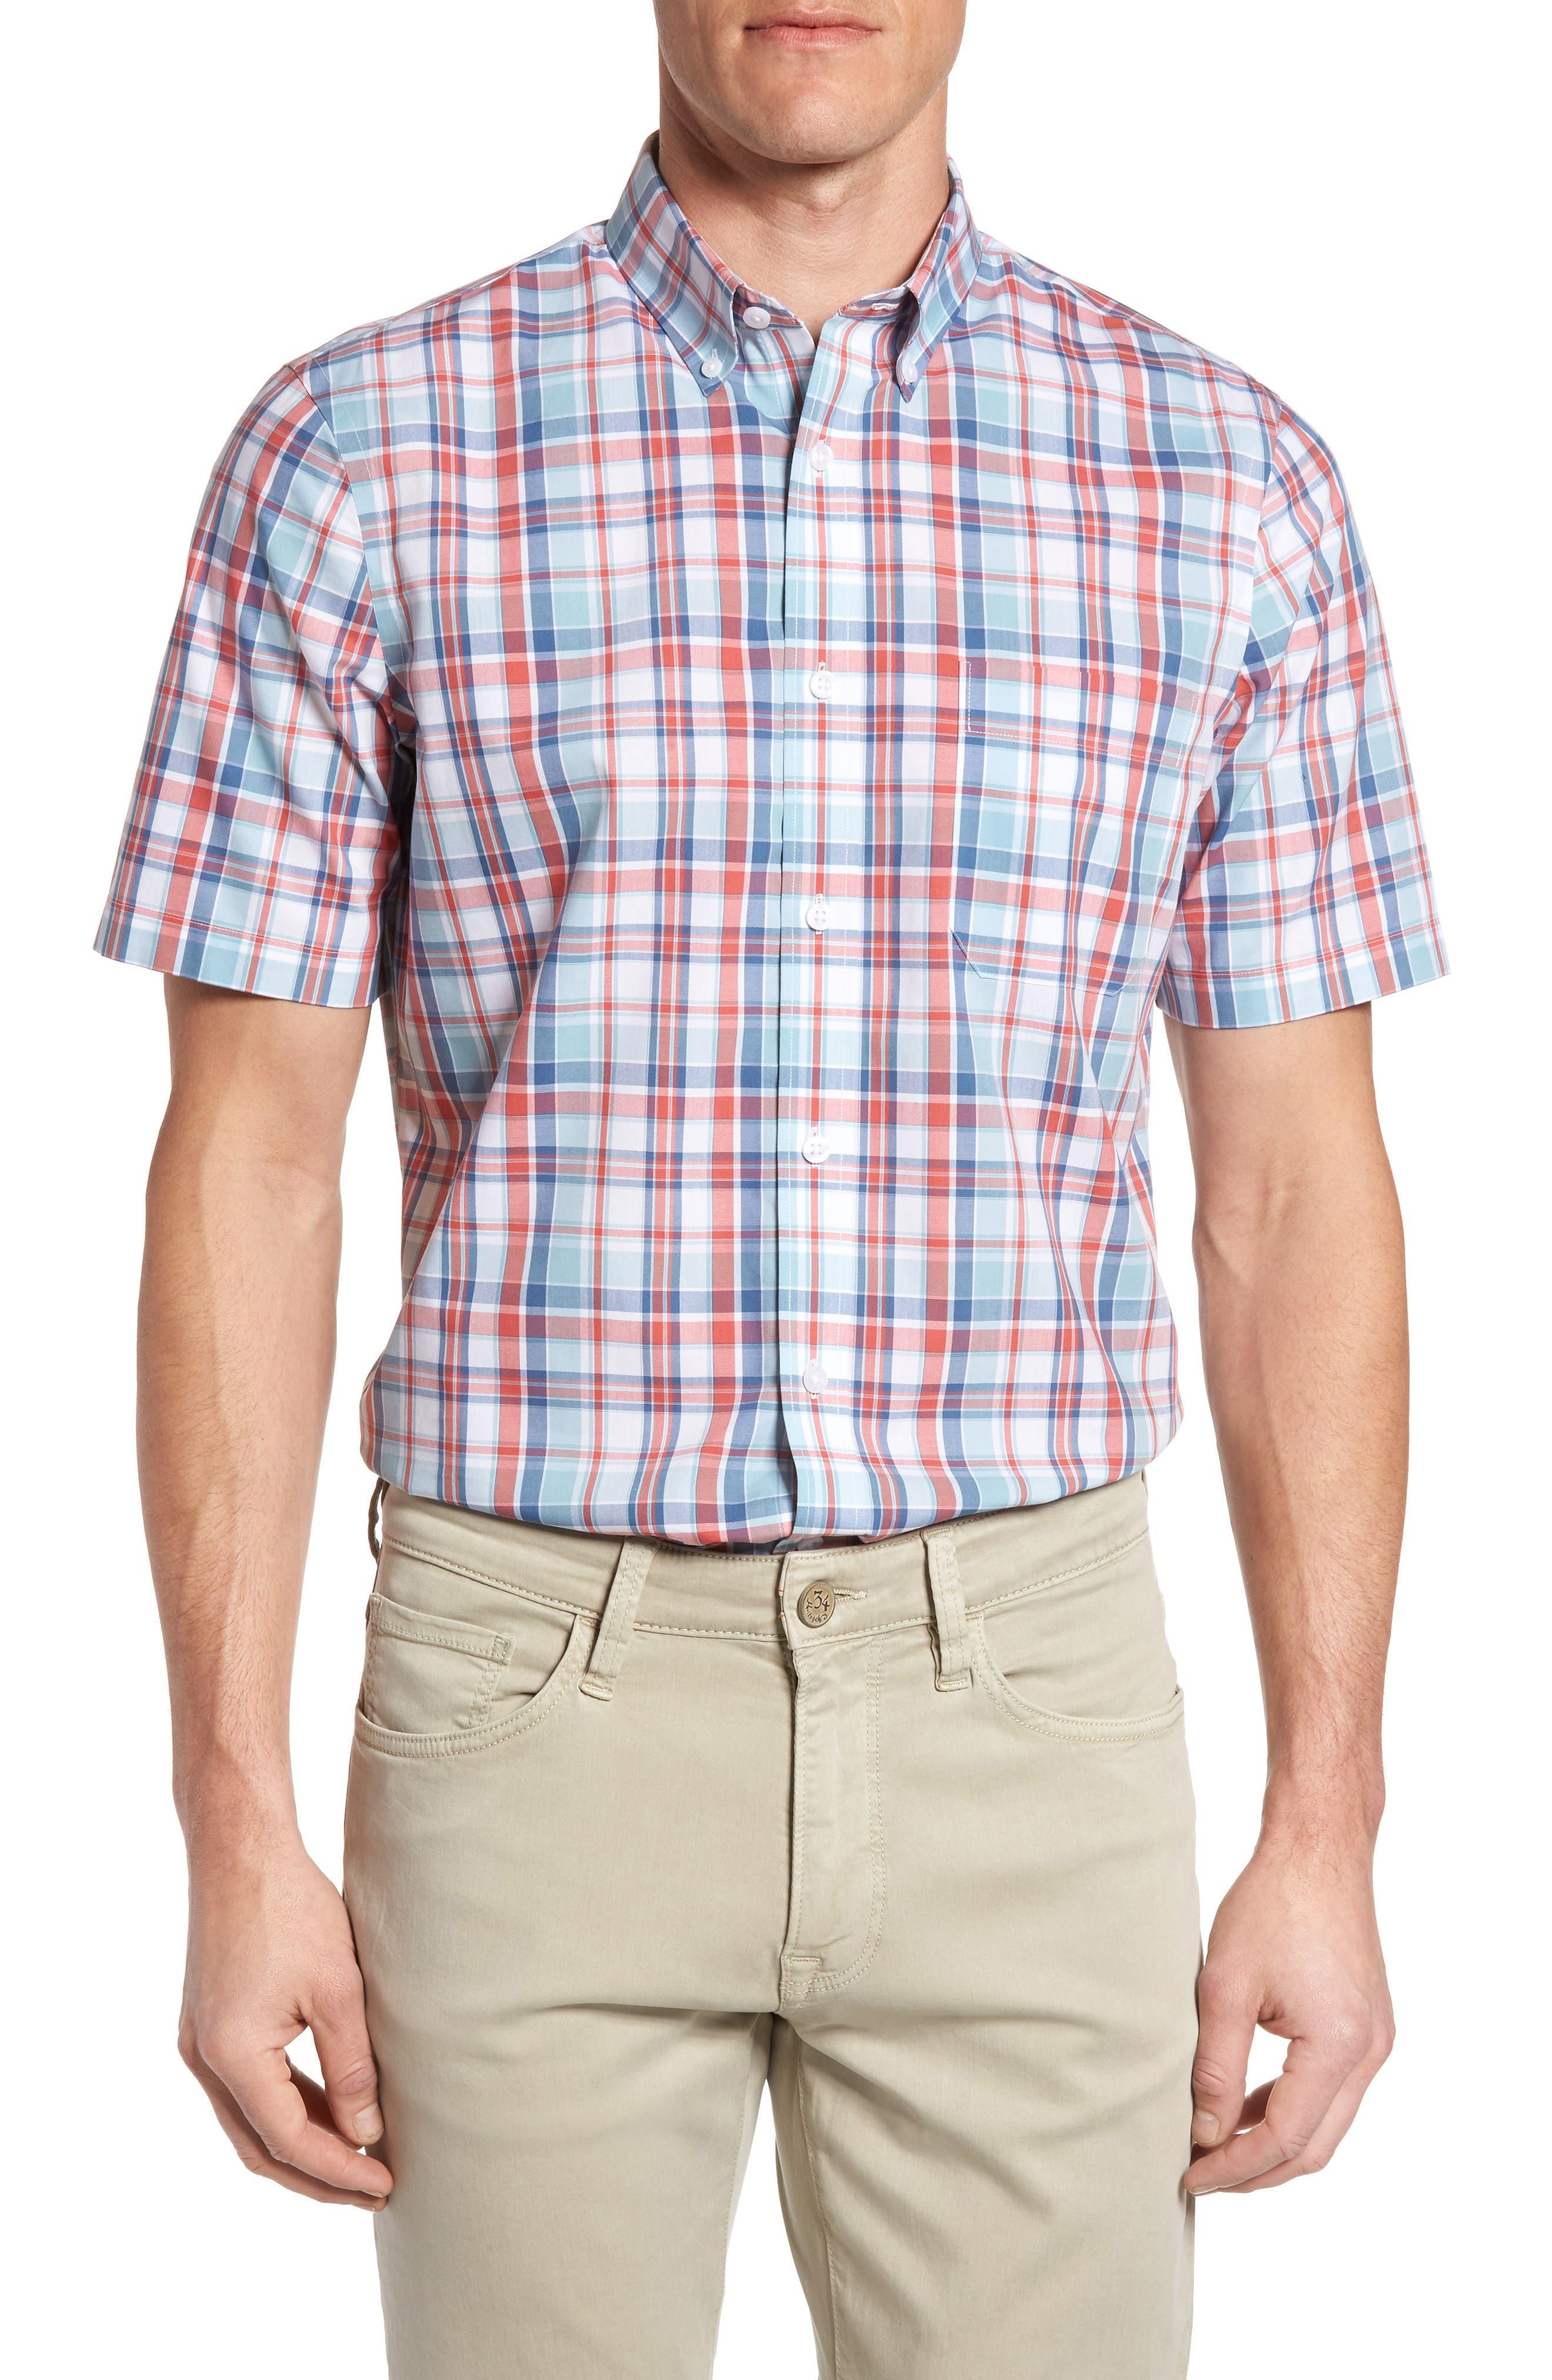 Nordstrom Men's Shop Smartcare™ Regular Fit Plaid Sport Shirt (Regular & Tall)